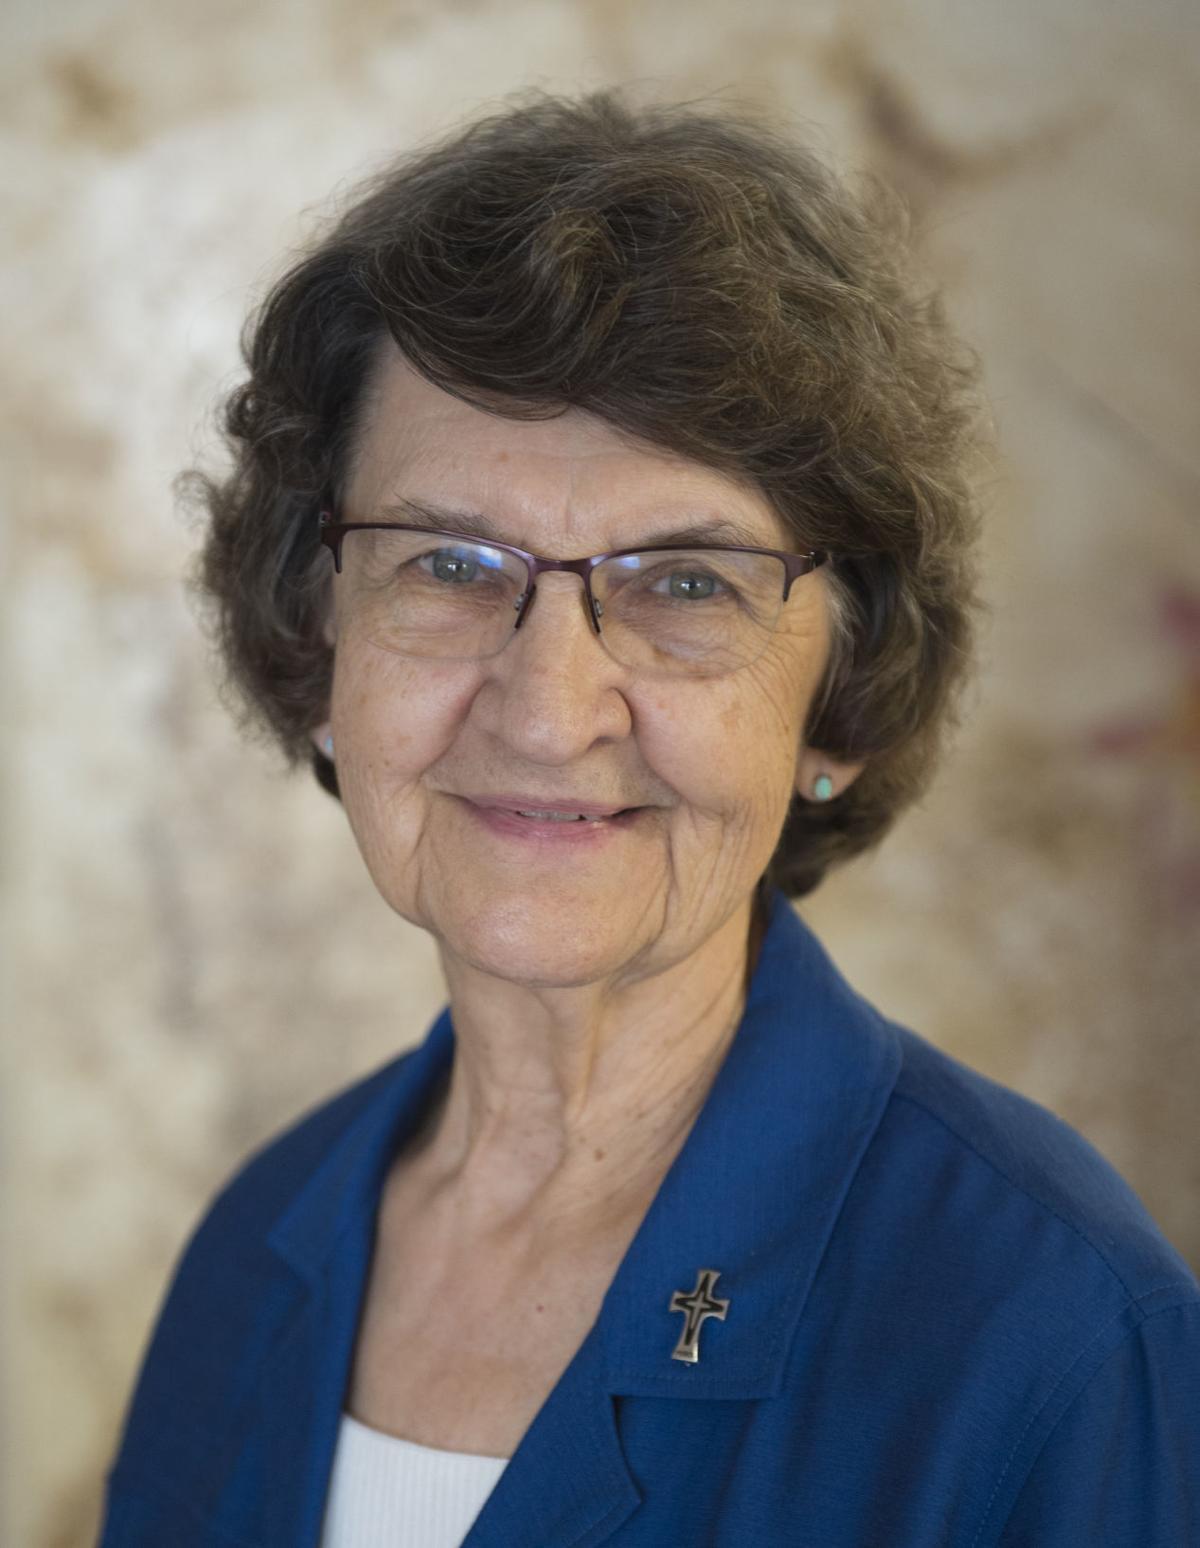 Sr. Rose Mary Boessen